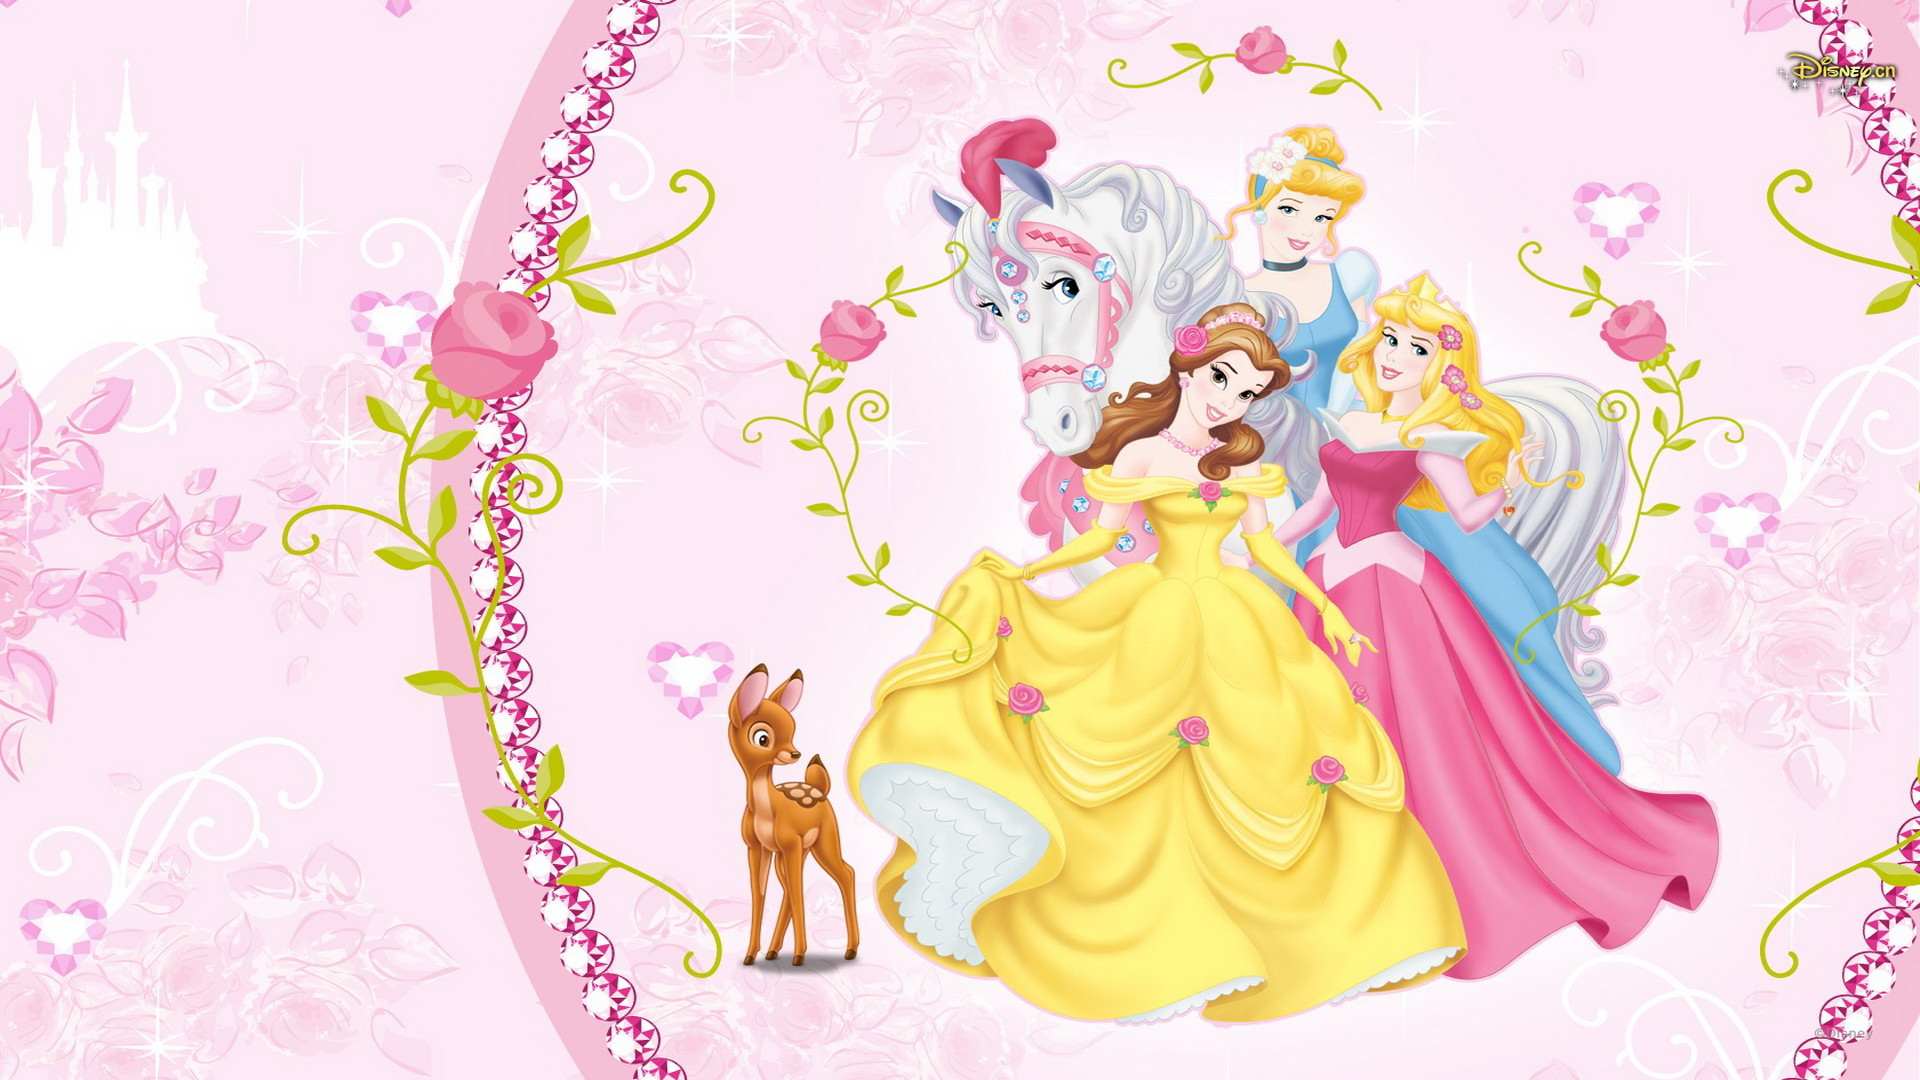 Beautiful Disney Princess Aurora, Belle and Cinderella Wallpaper